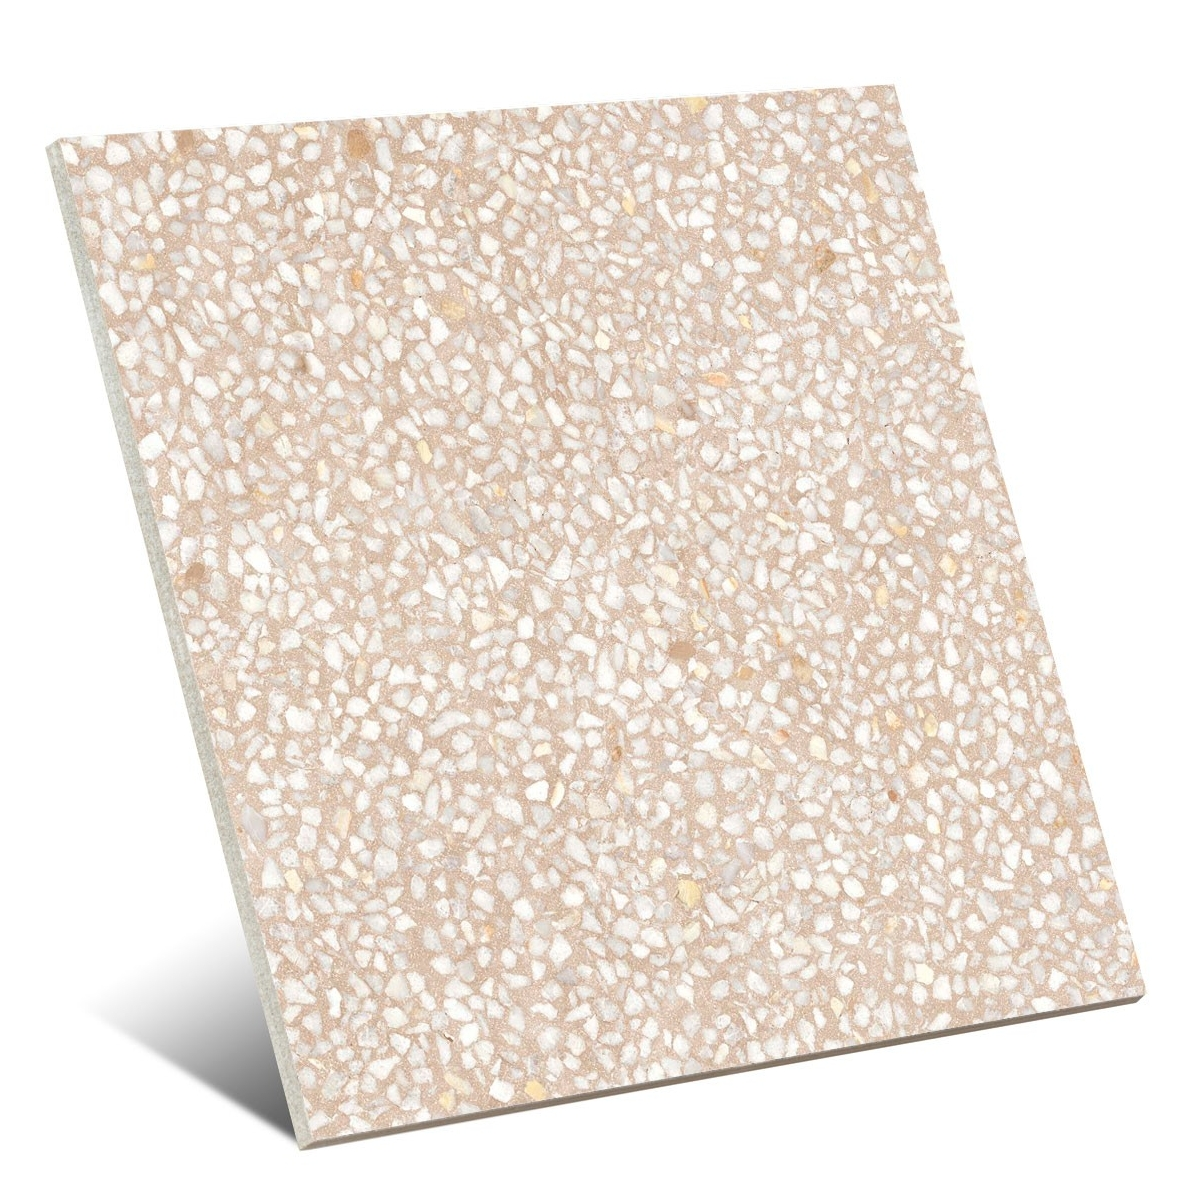 Portofino Crema 60x60 (caja 1,08 m2)